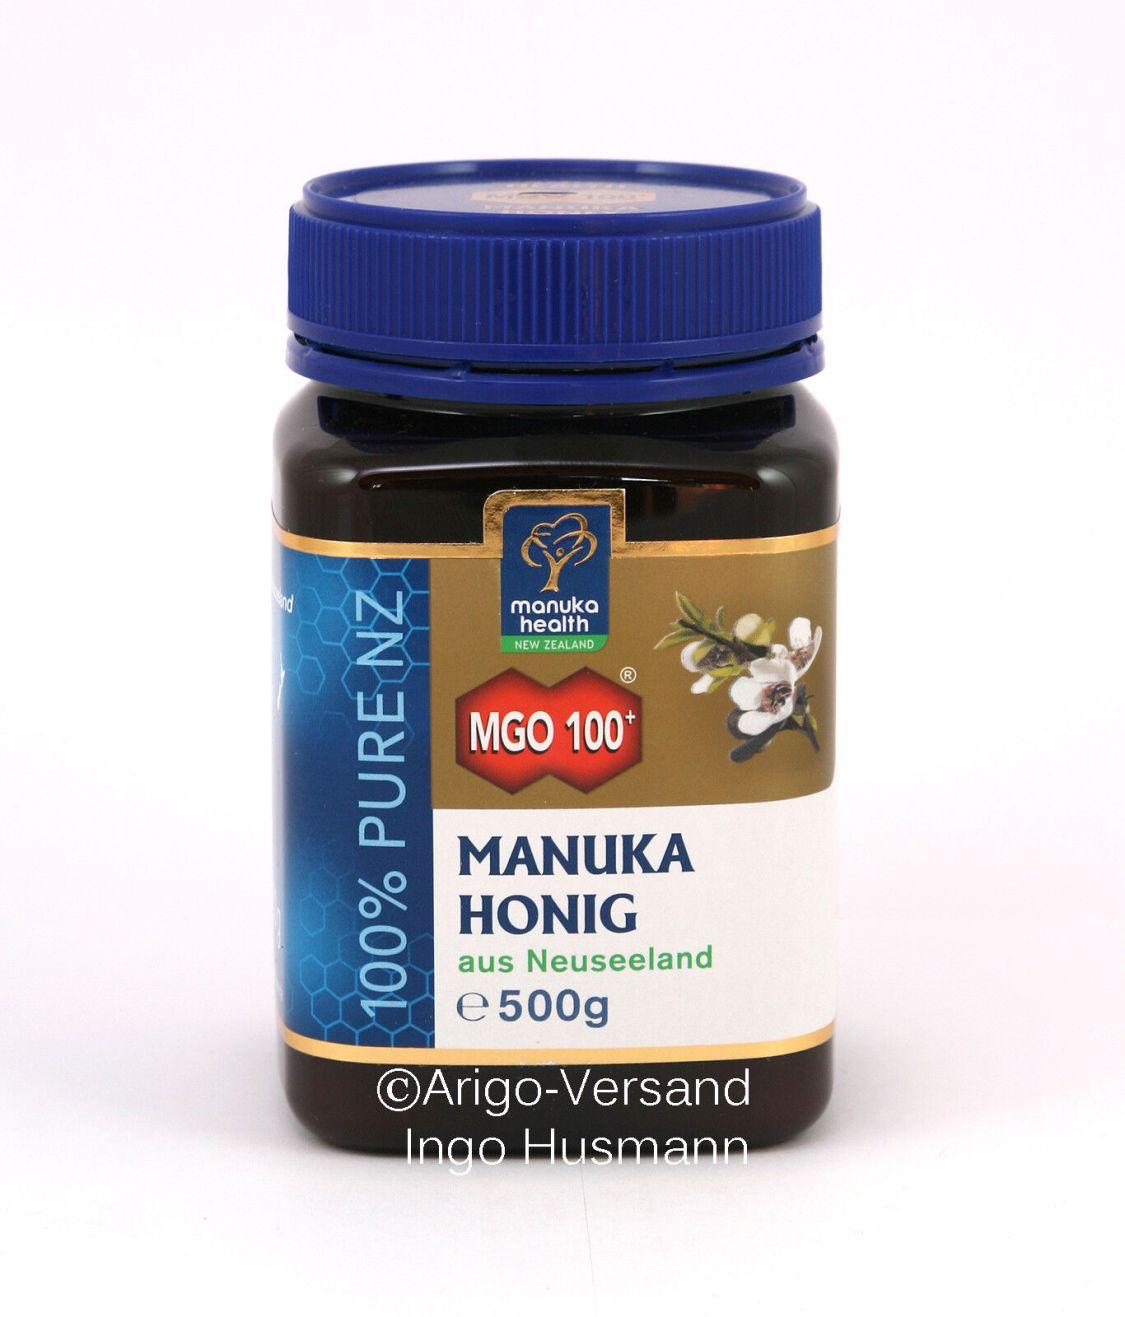 Aktiver Manuka-Honig MGO™ 100+ aus Neuseeland, 50g / 500g / 1000g